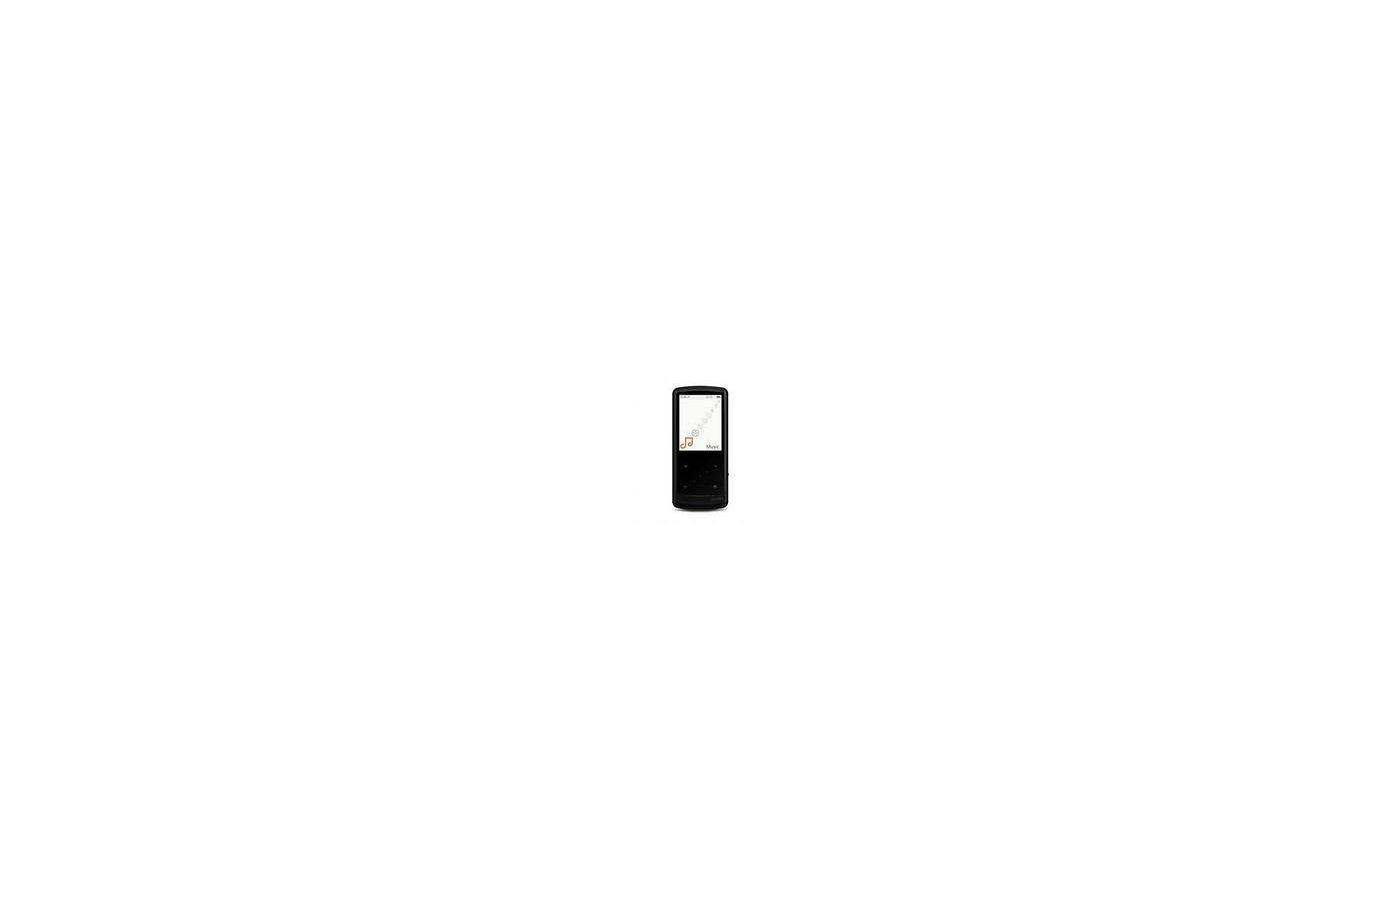 МР3 плеер Cowon Iaudio 9+ 8Gb черный